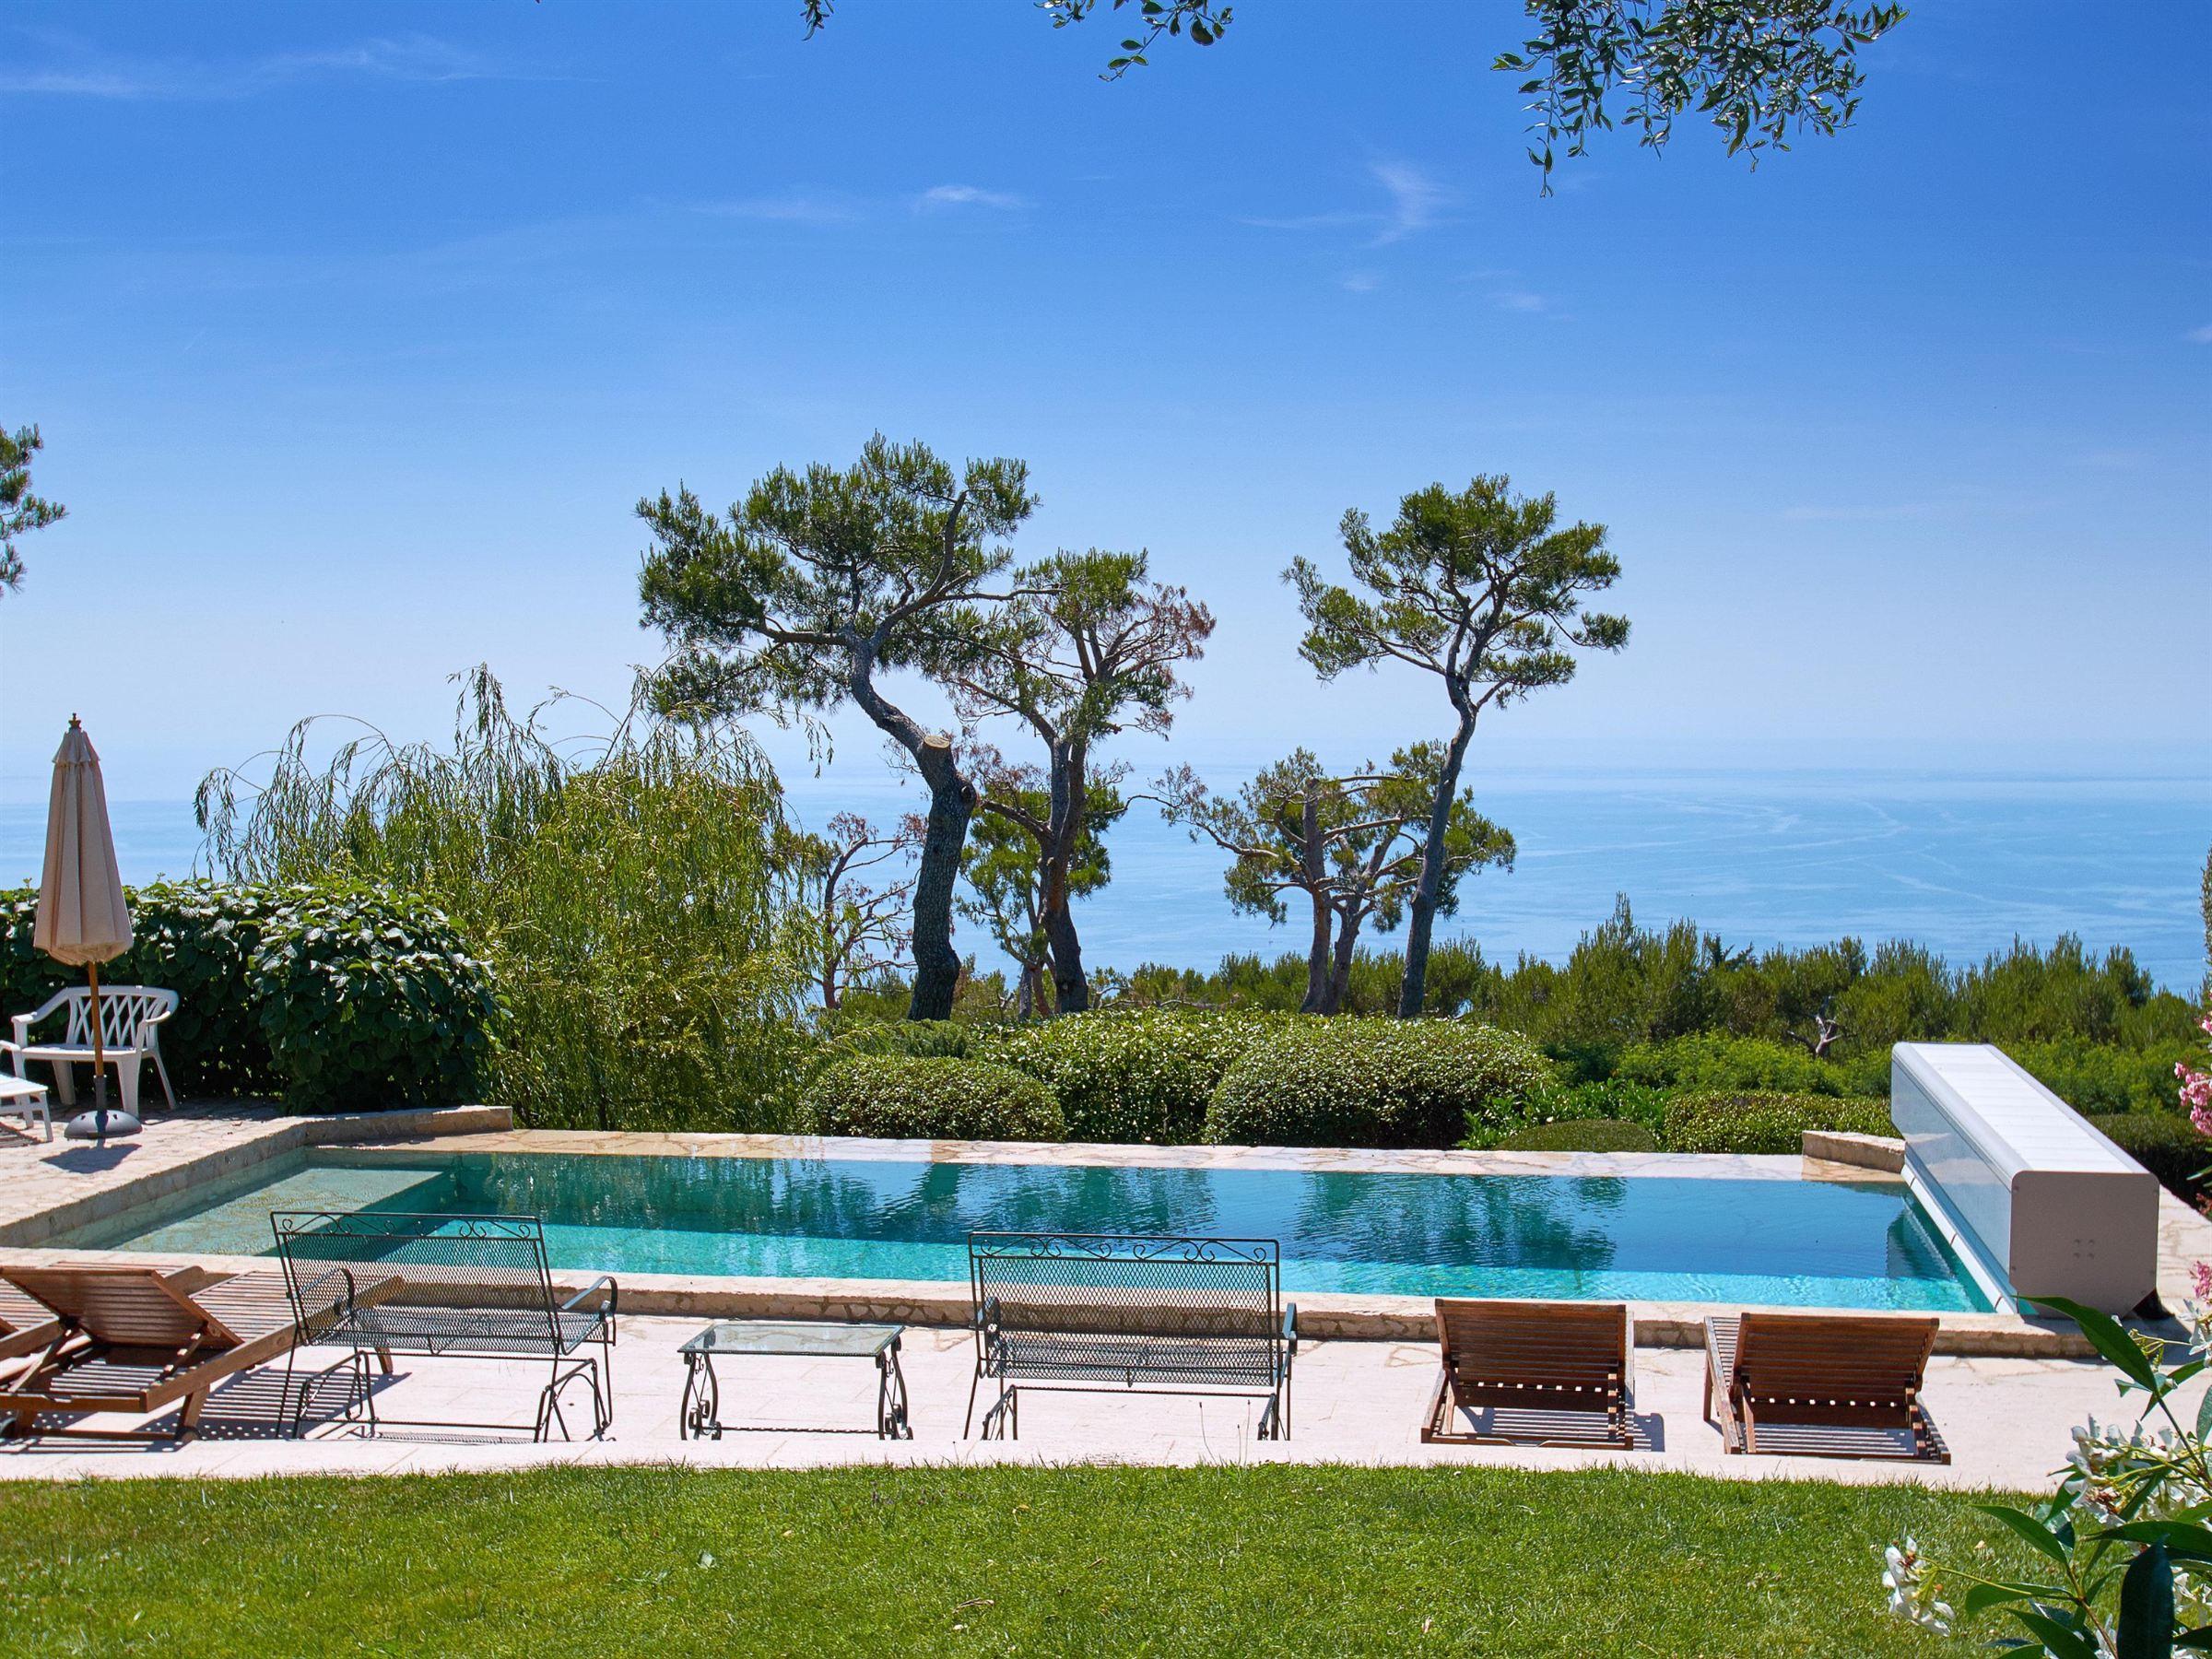 Einfamilienhaus für Verkauf beim Beautiful villa in a private estate with panoramic views to the sea Eze, Provence-Alpes-Cote D'Azur 06360 Frankreich